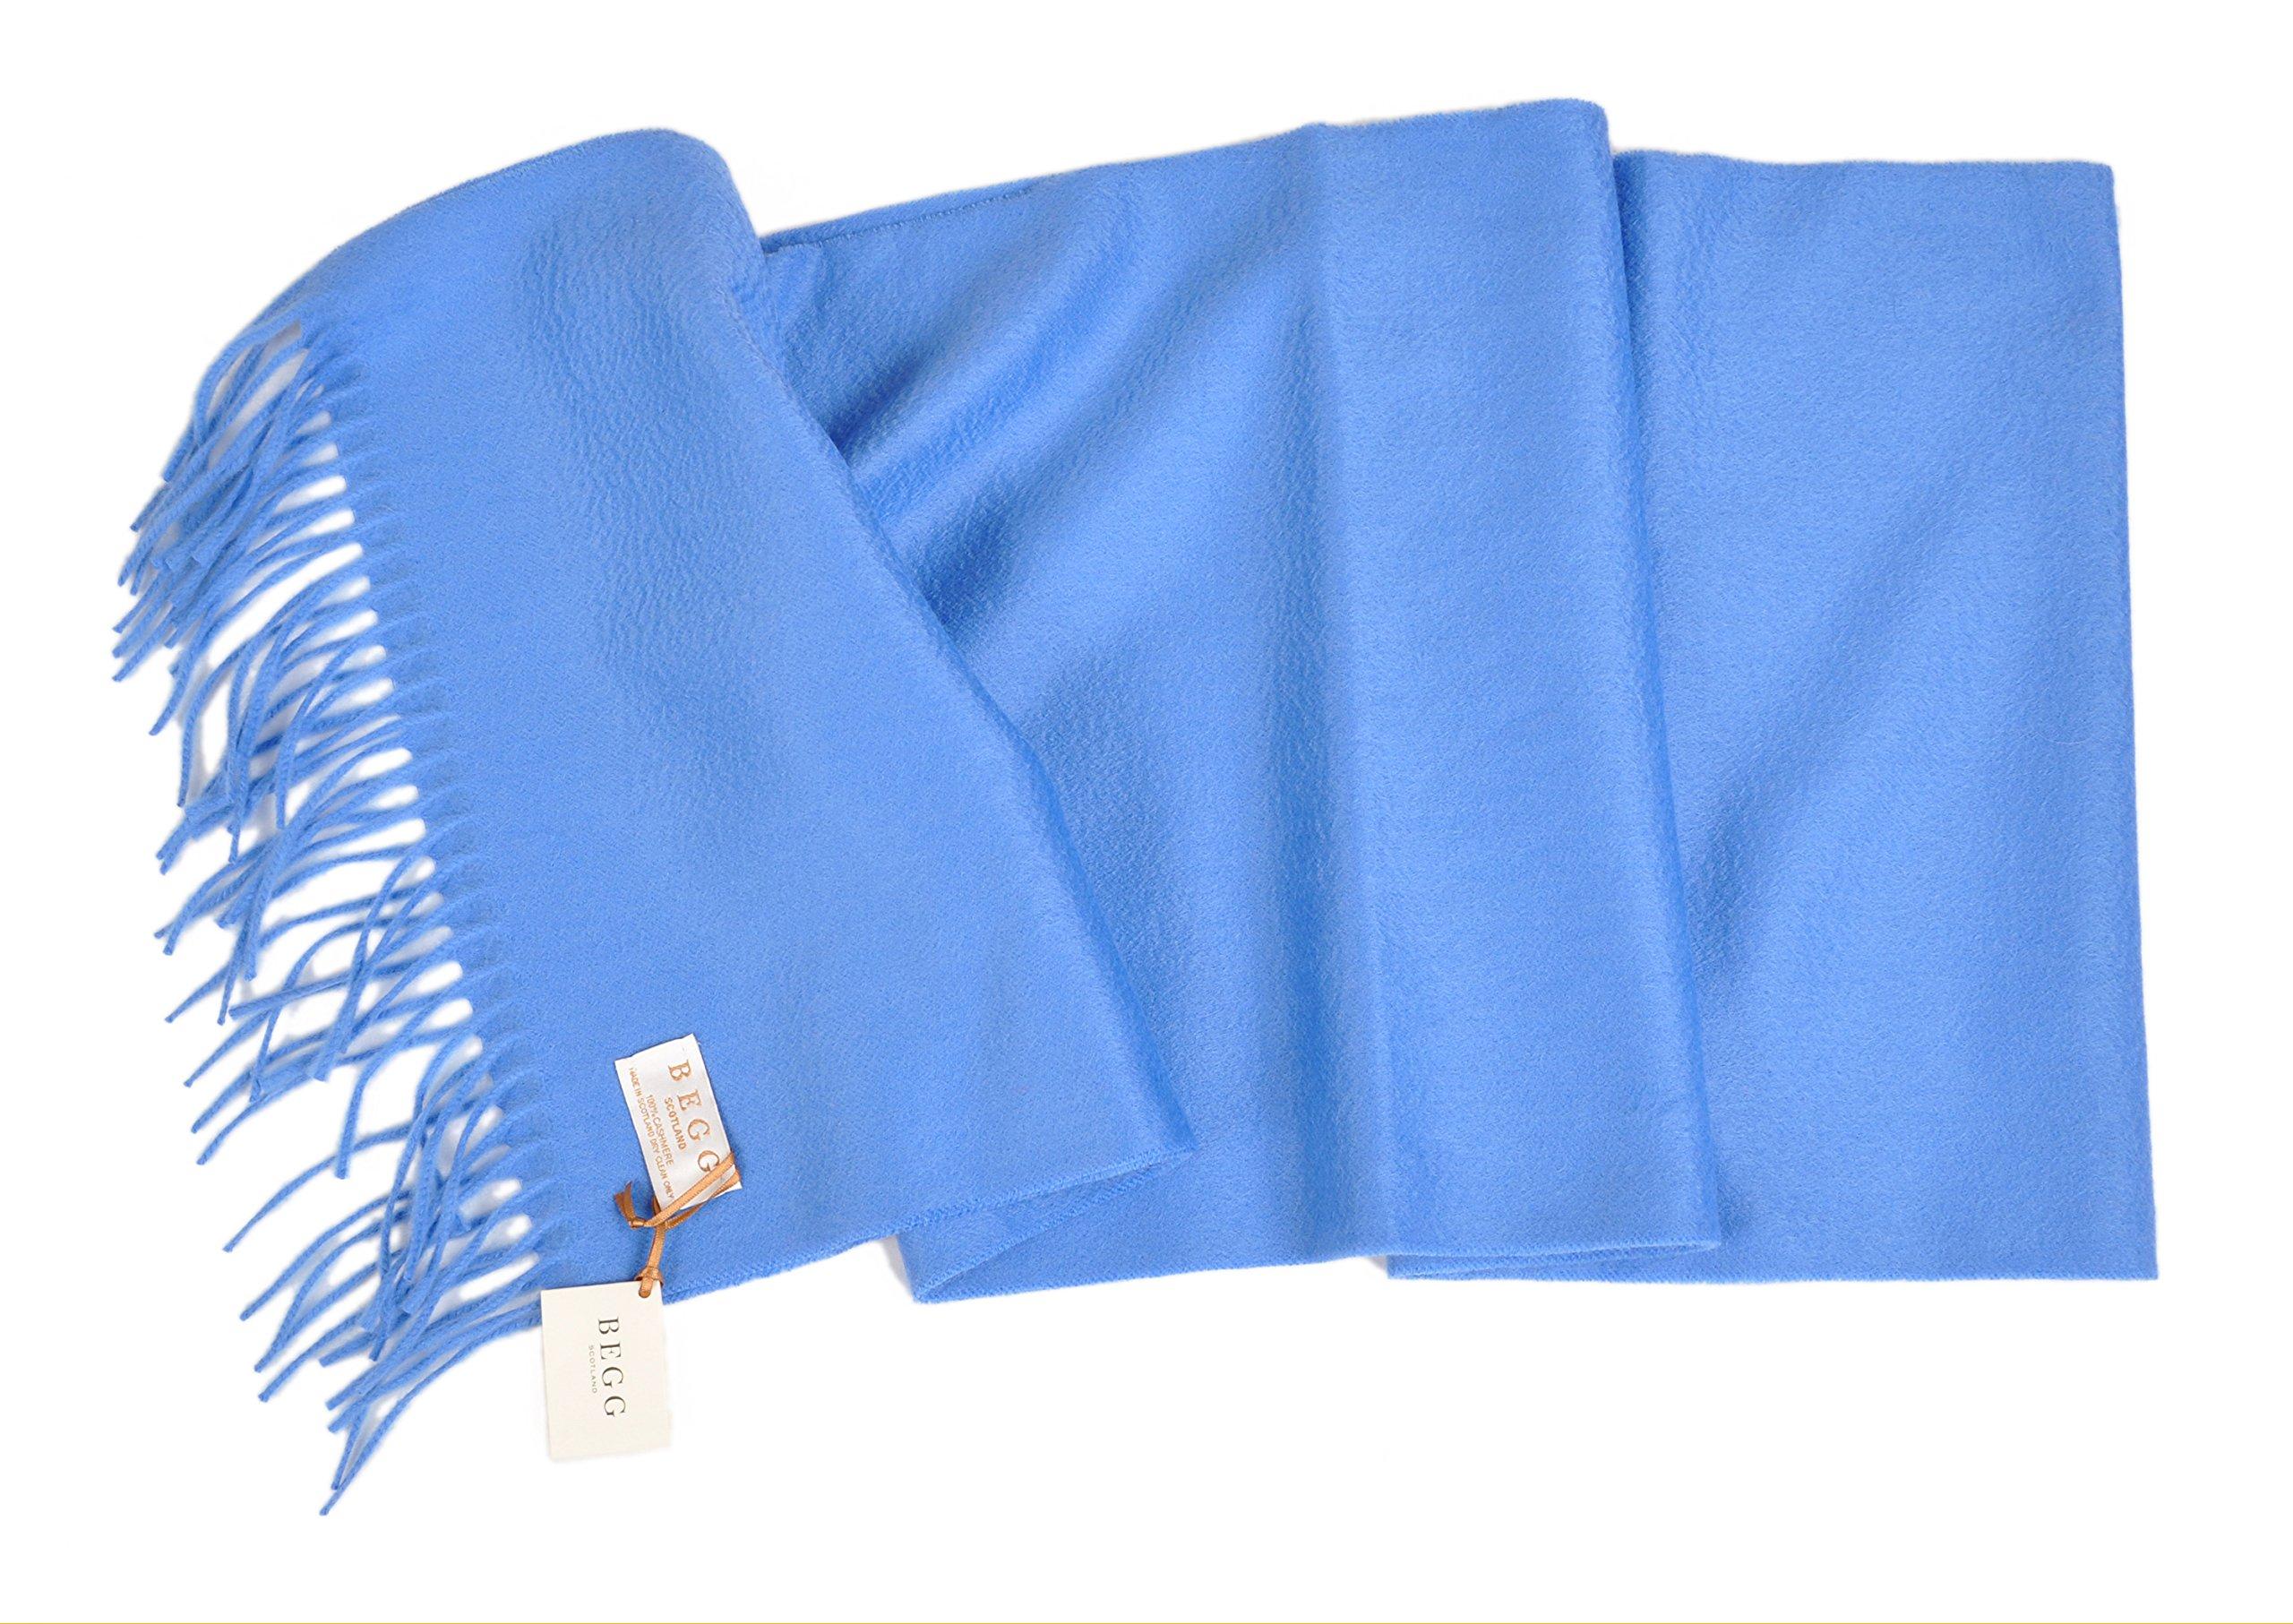 Begg-Scotland 14''x72'' Pure Luxury Cashmere Large Scarf - Azure